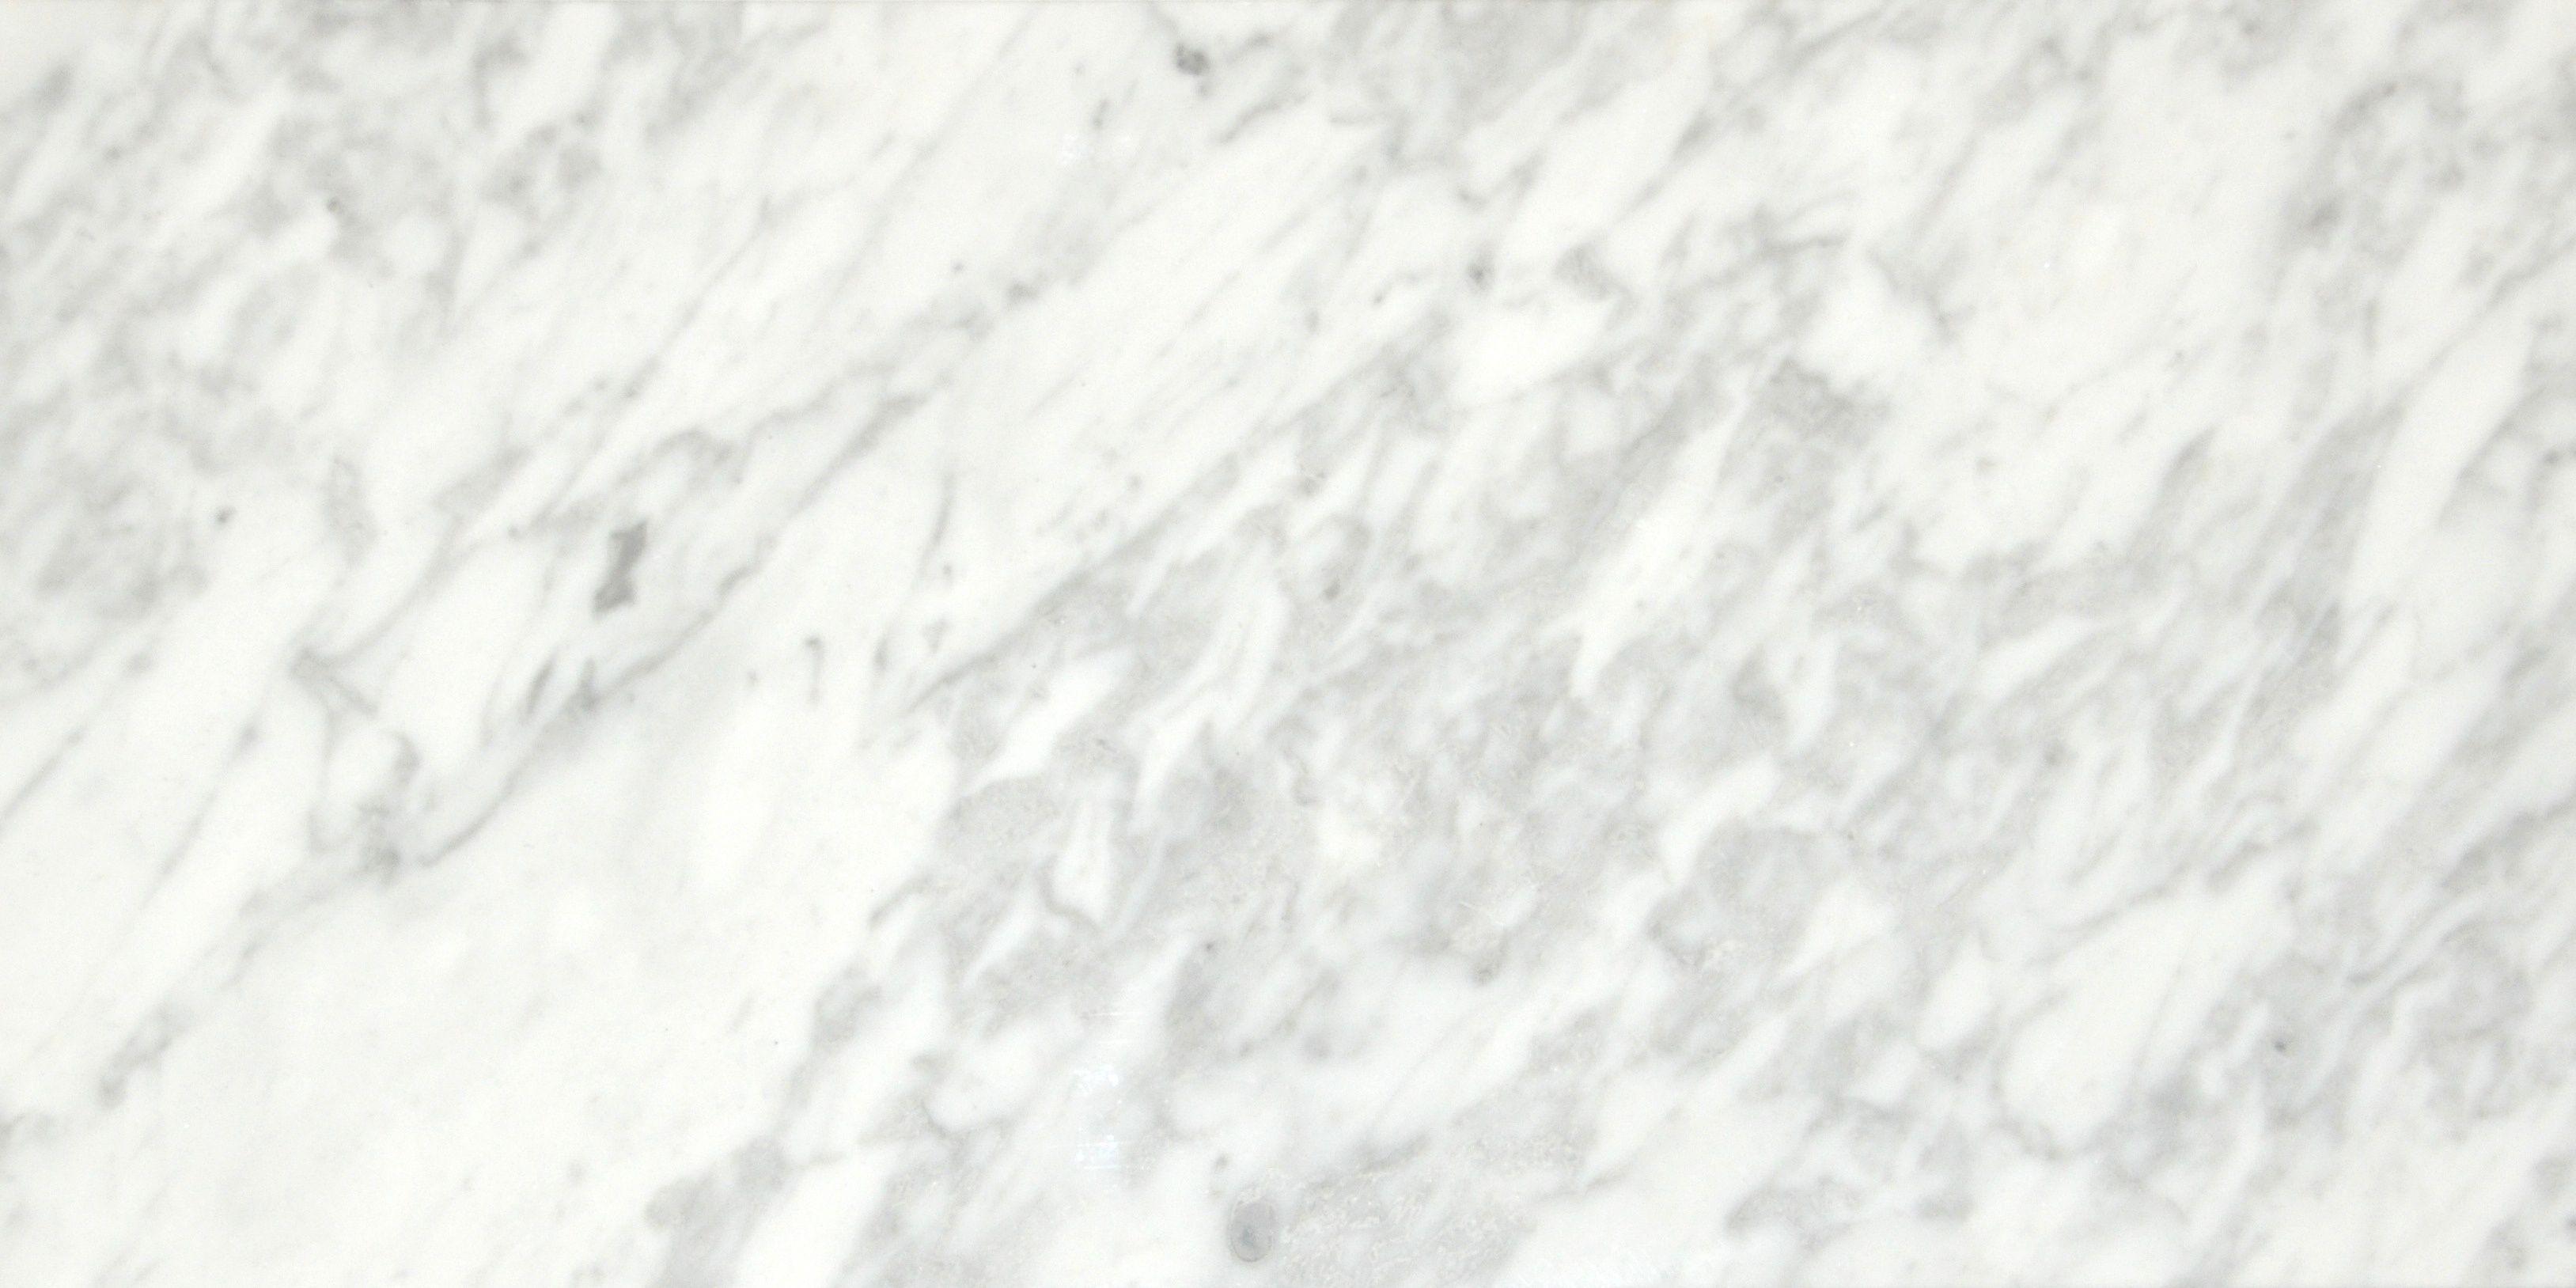 12x24 Stone Bianco Venatino Polished Marble Field Tile Logan Pinterest White